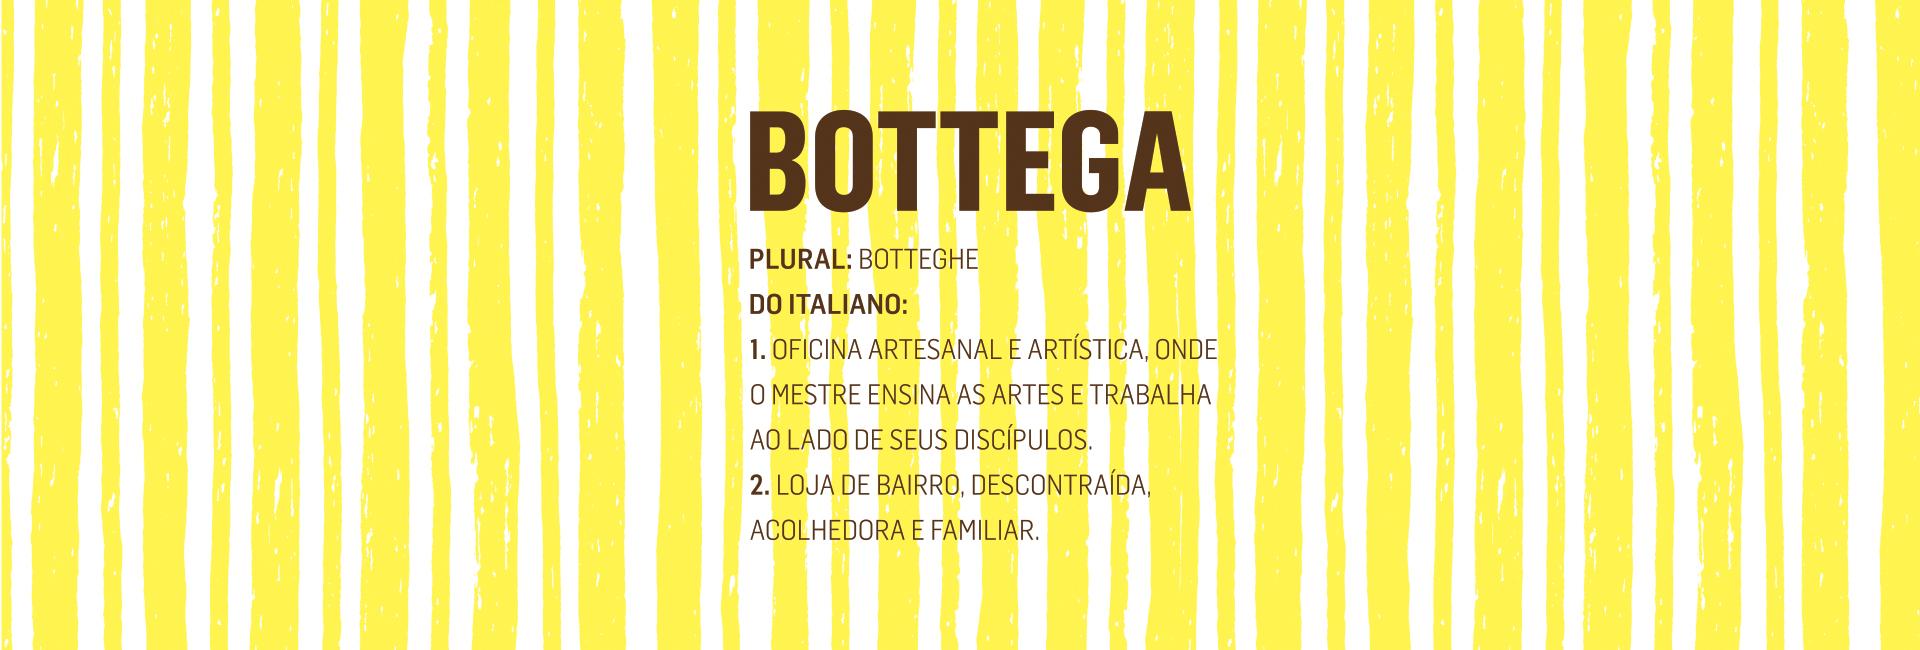 14_bottega.jpg